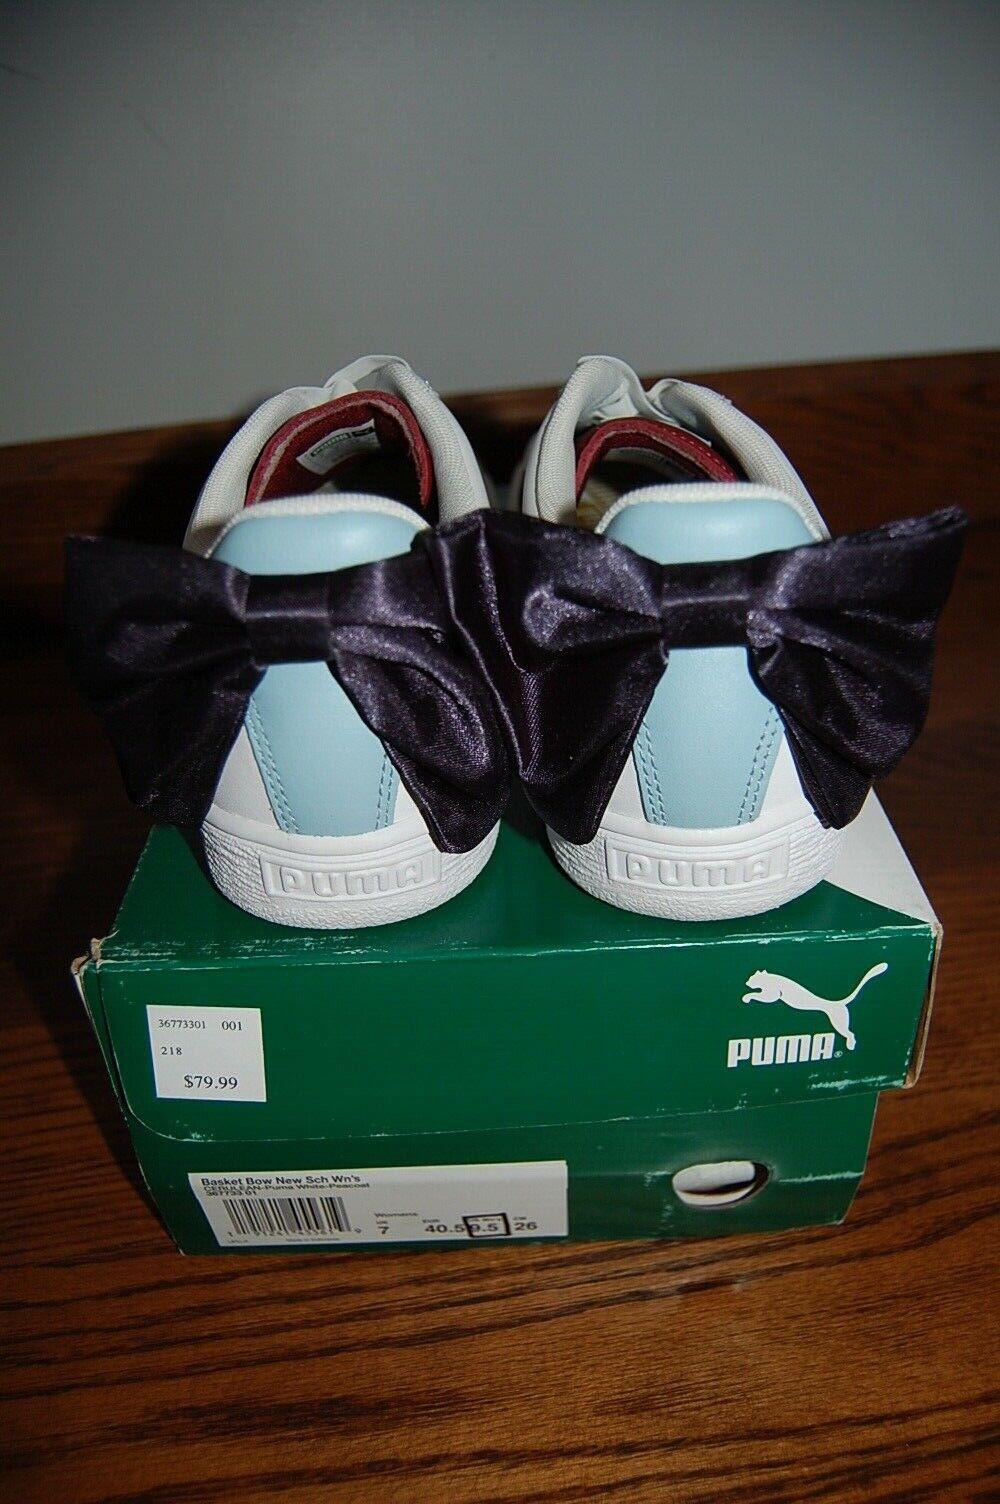 NIB Puma Women's Basket Bow Casual Sneakers Women's Women's Women's shoes 9.5 4fbab6